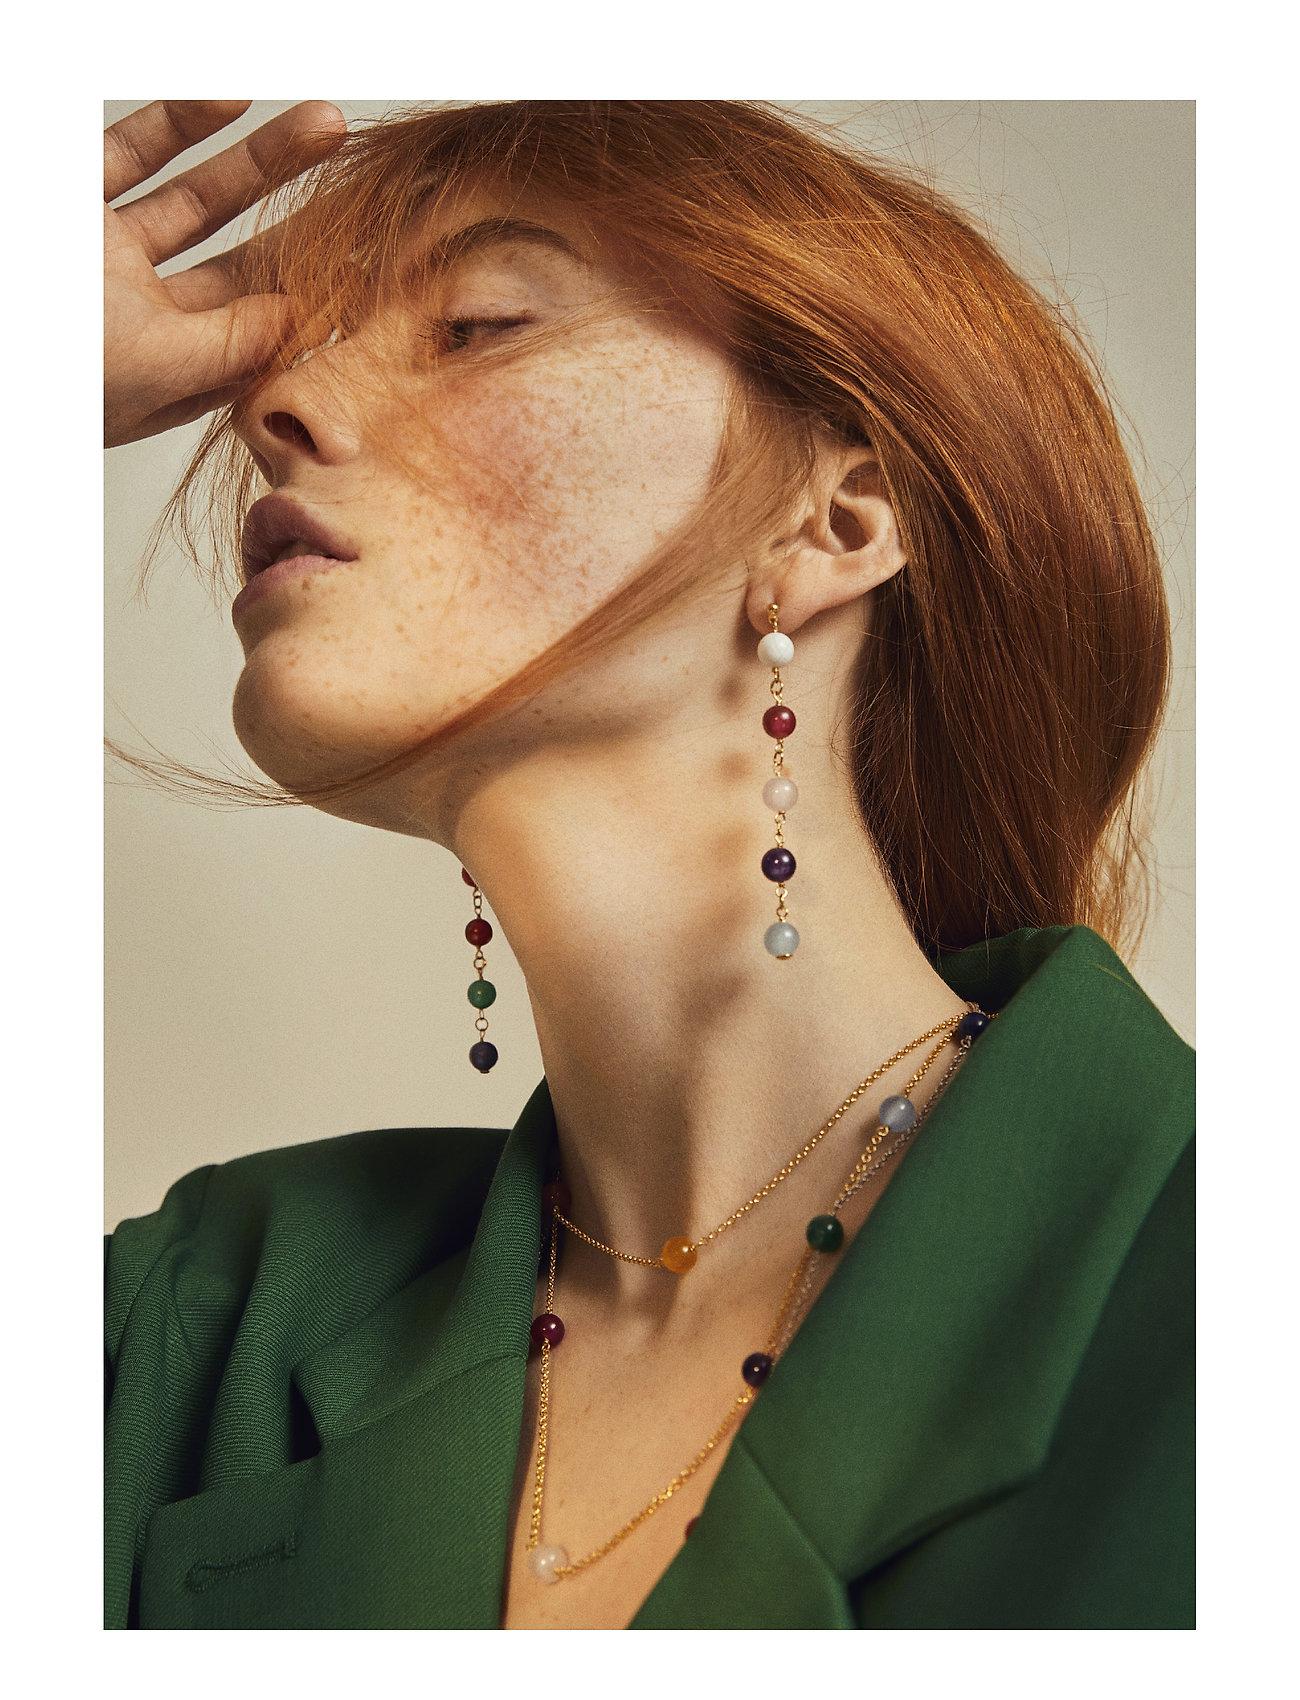 SOPHIE by SOPHIE - Childhood earrings - statement earrings - gold - 0